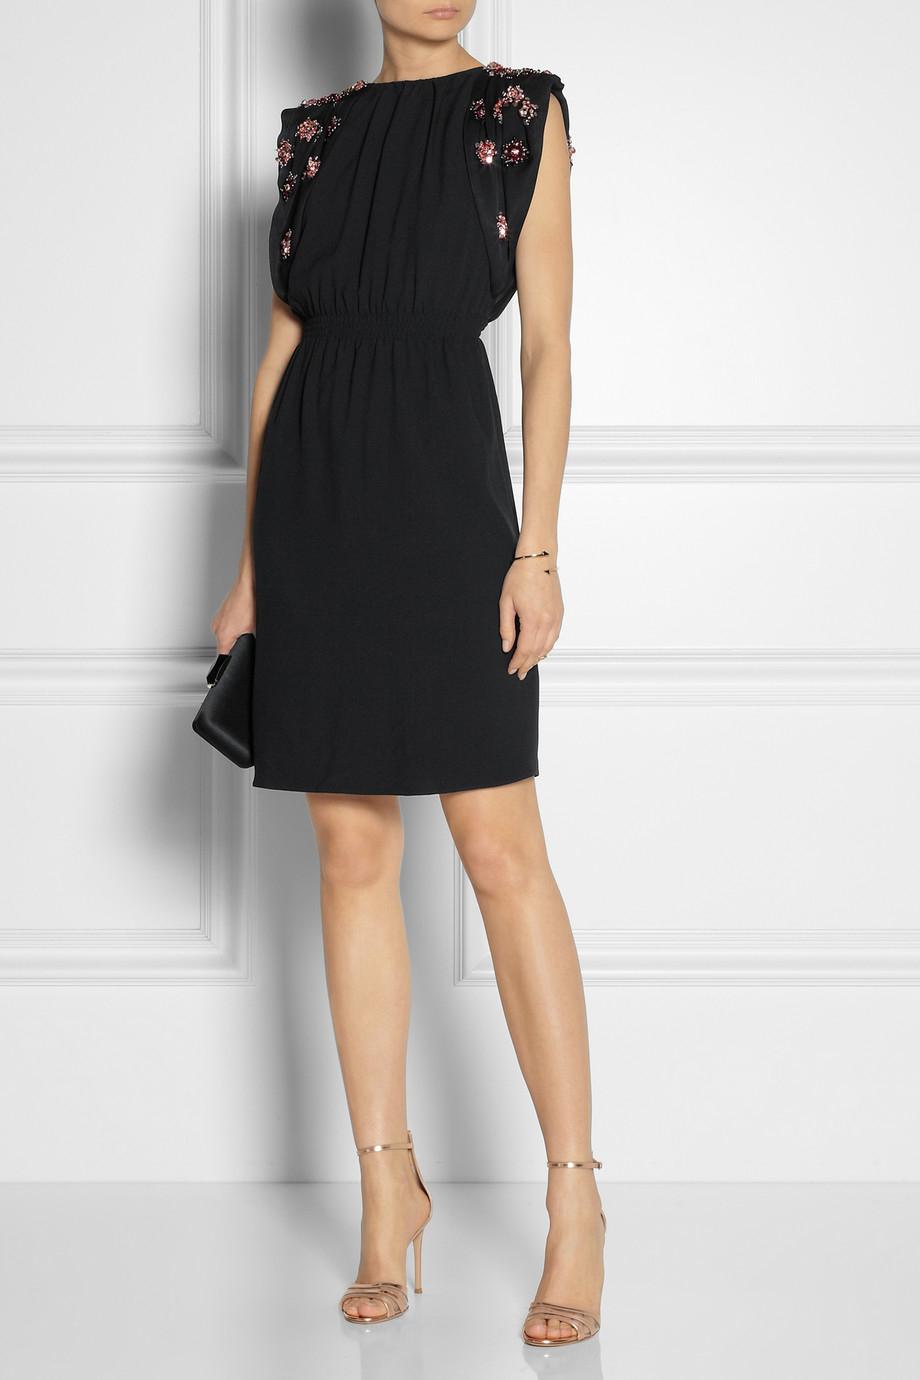 Lyst Miu Miu Embellished Open Back Crepe Dress In Black